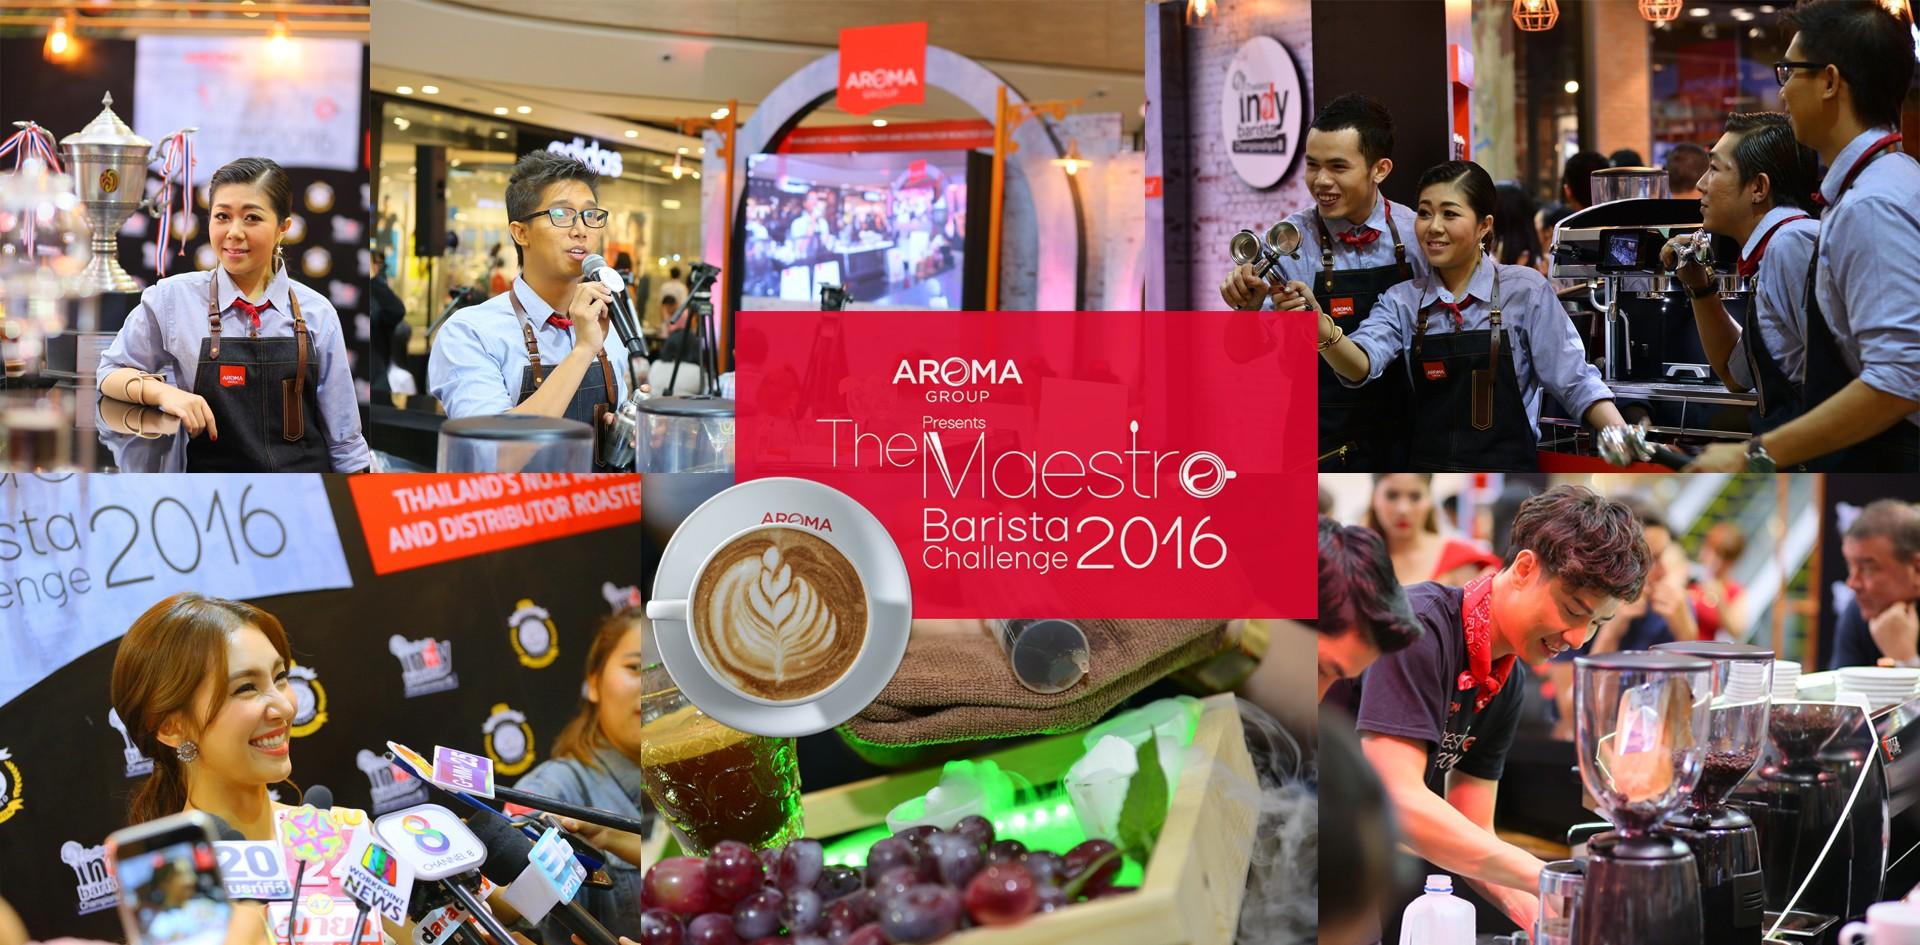 The Maestro Barista Challenge 2016 ค้นหานักชงมือทองไปแข่งระดับโลก!!